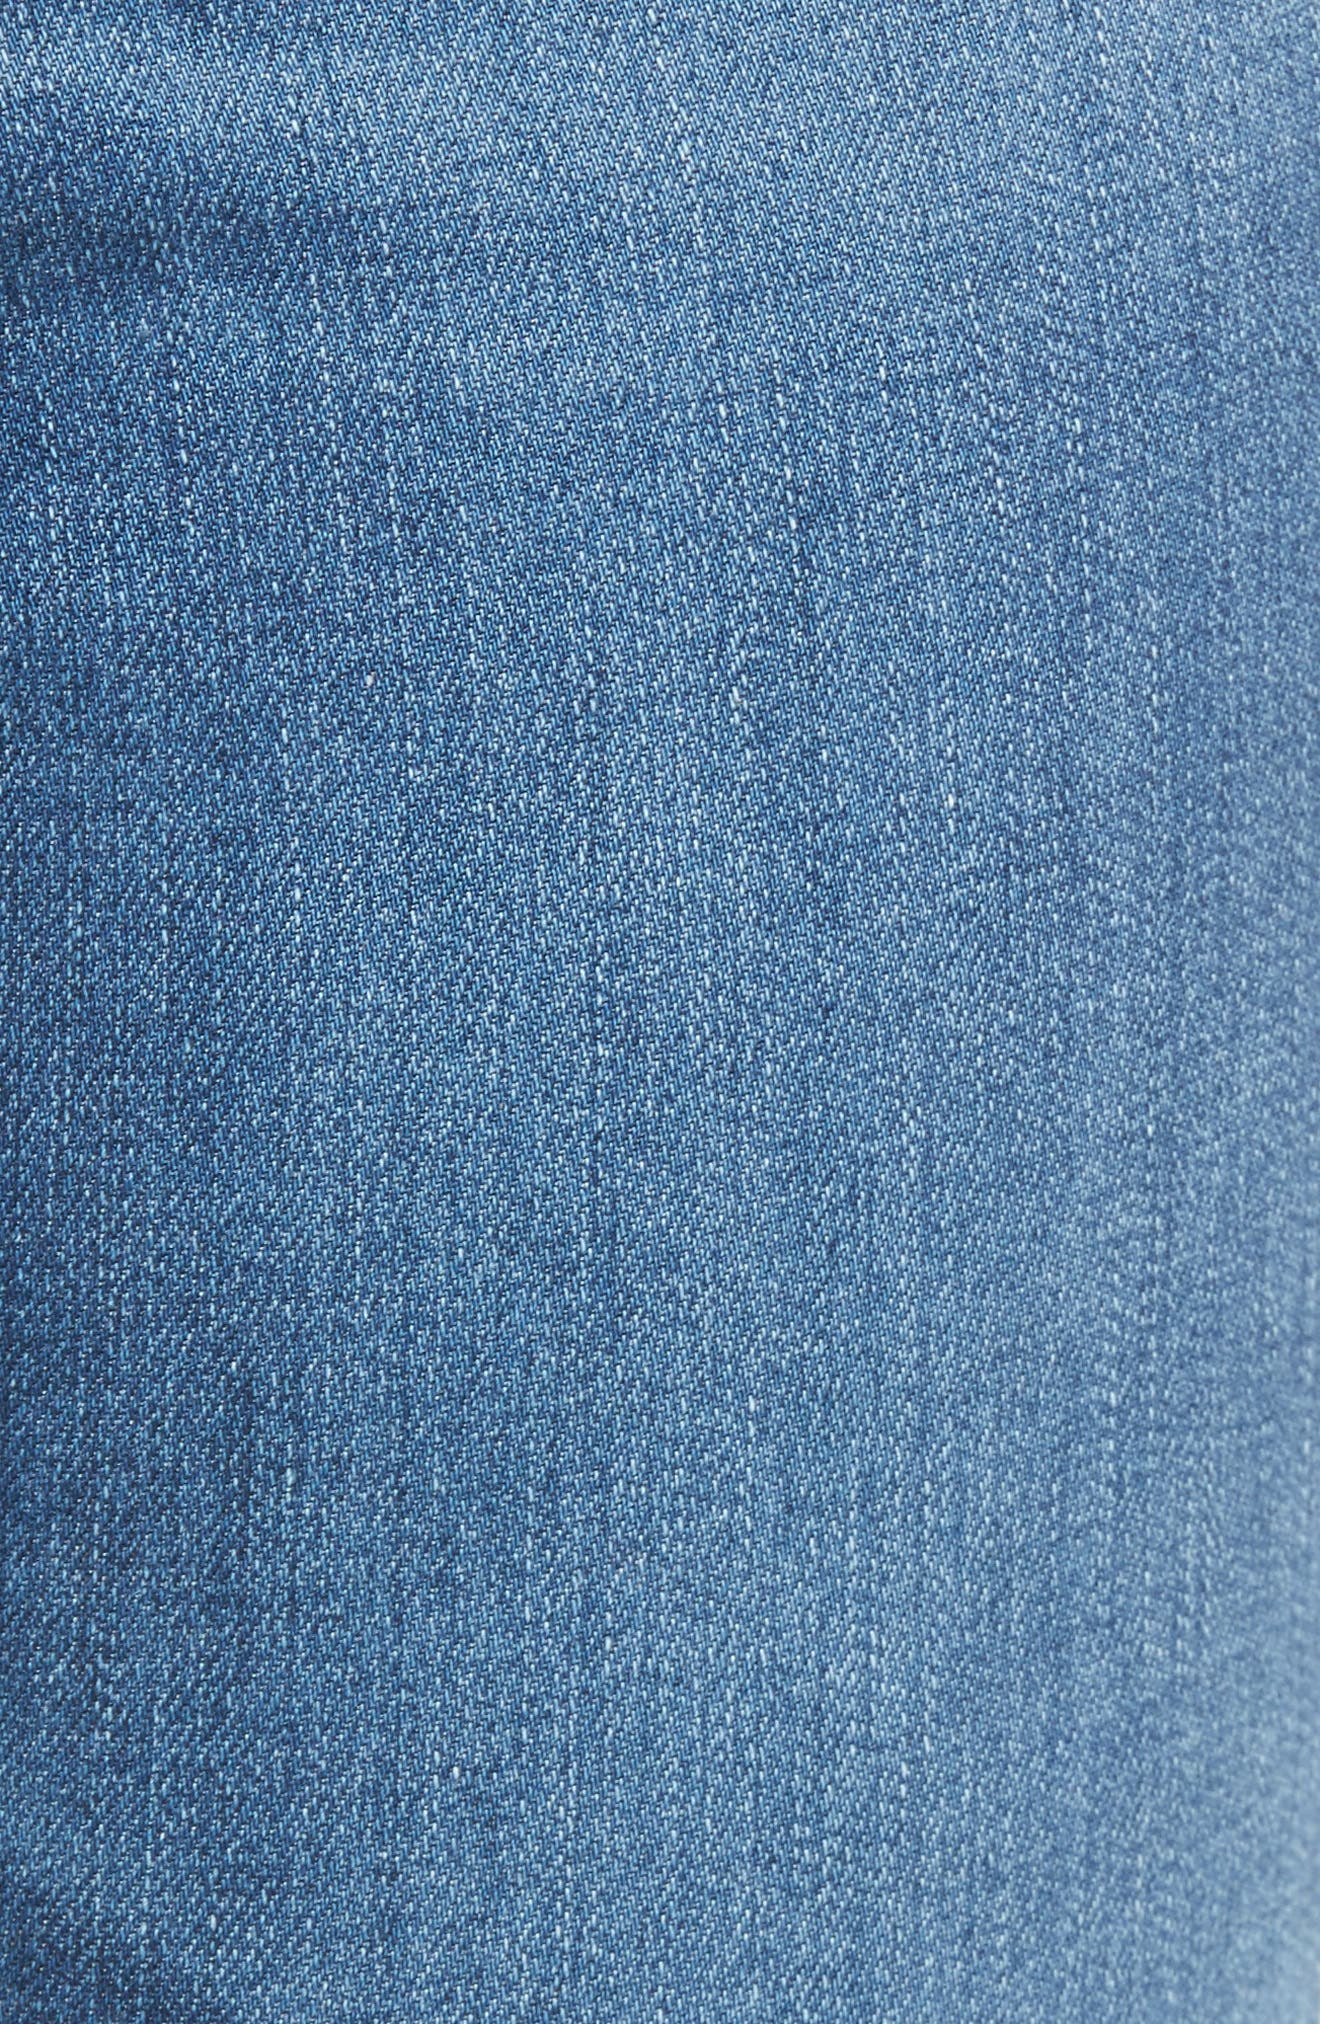 Mila High Waist Ankle Skinny Jeans,                             Alternate thumbnail 6, color,                             Indigo Viking